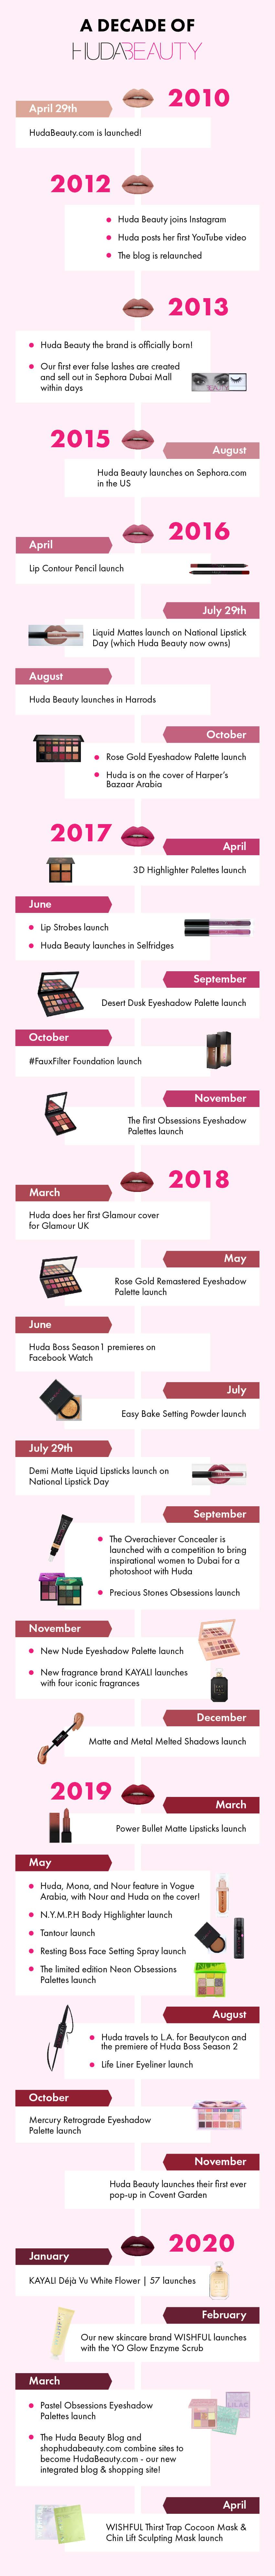 Huda Beauty Timeline